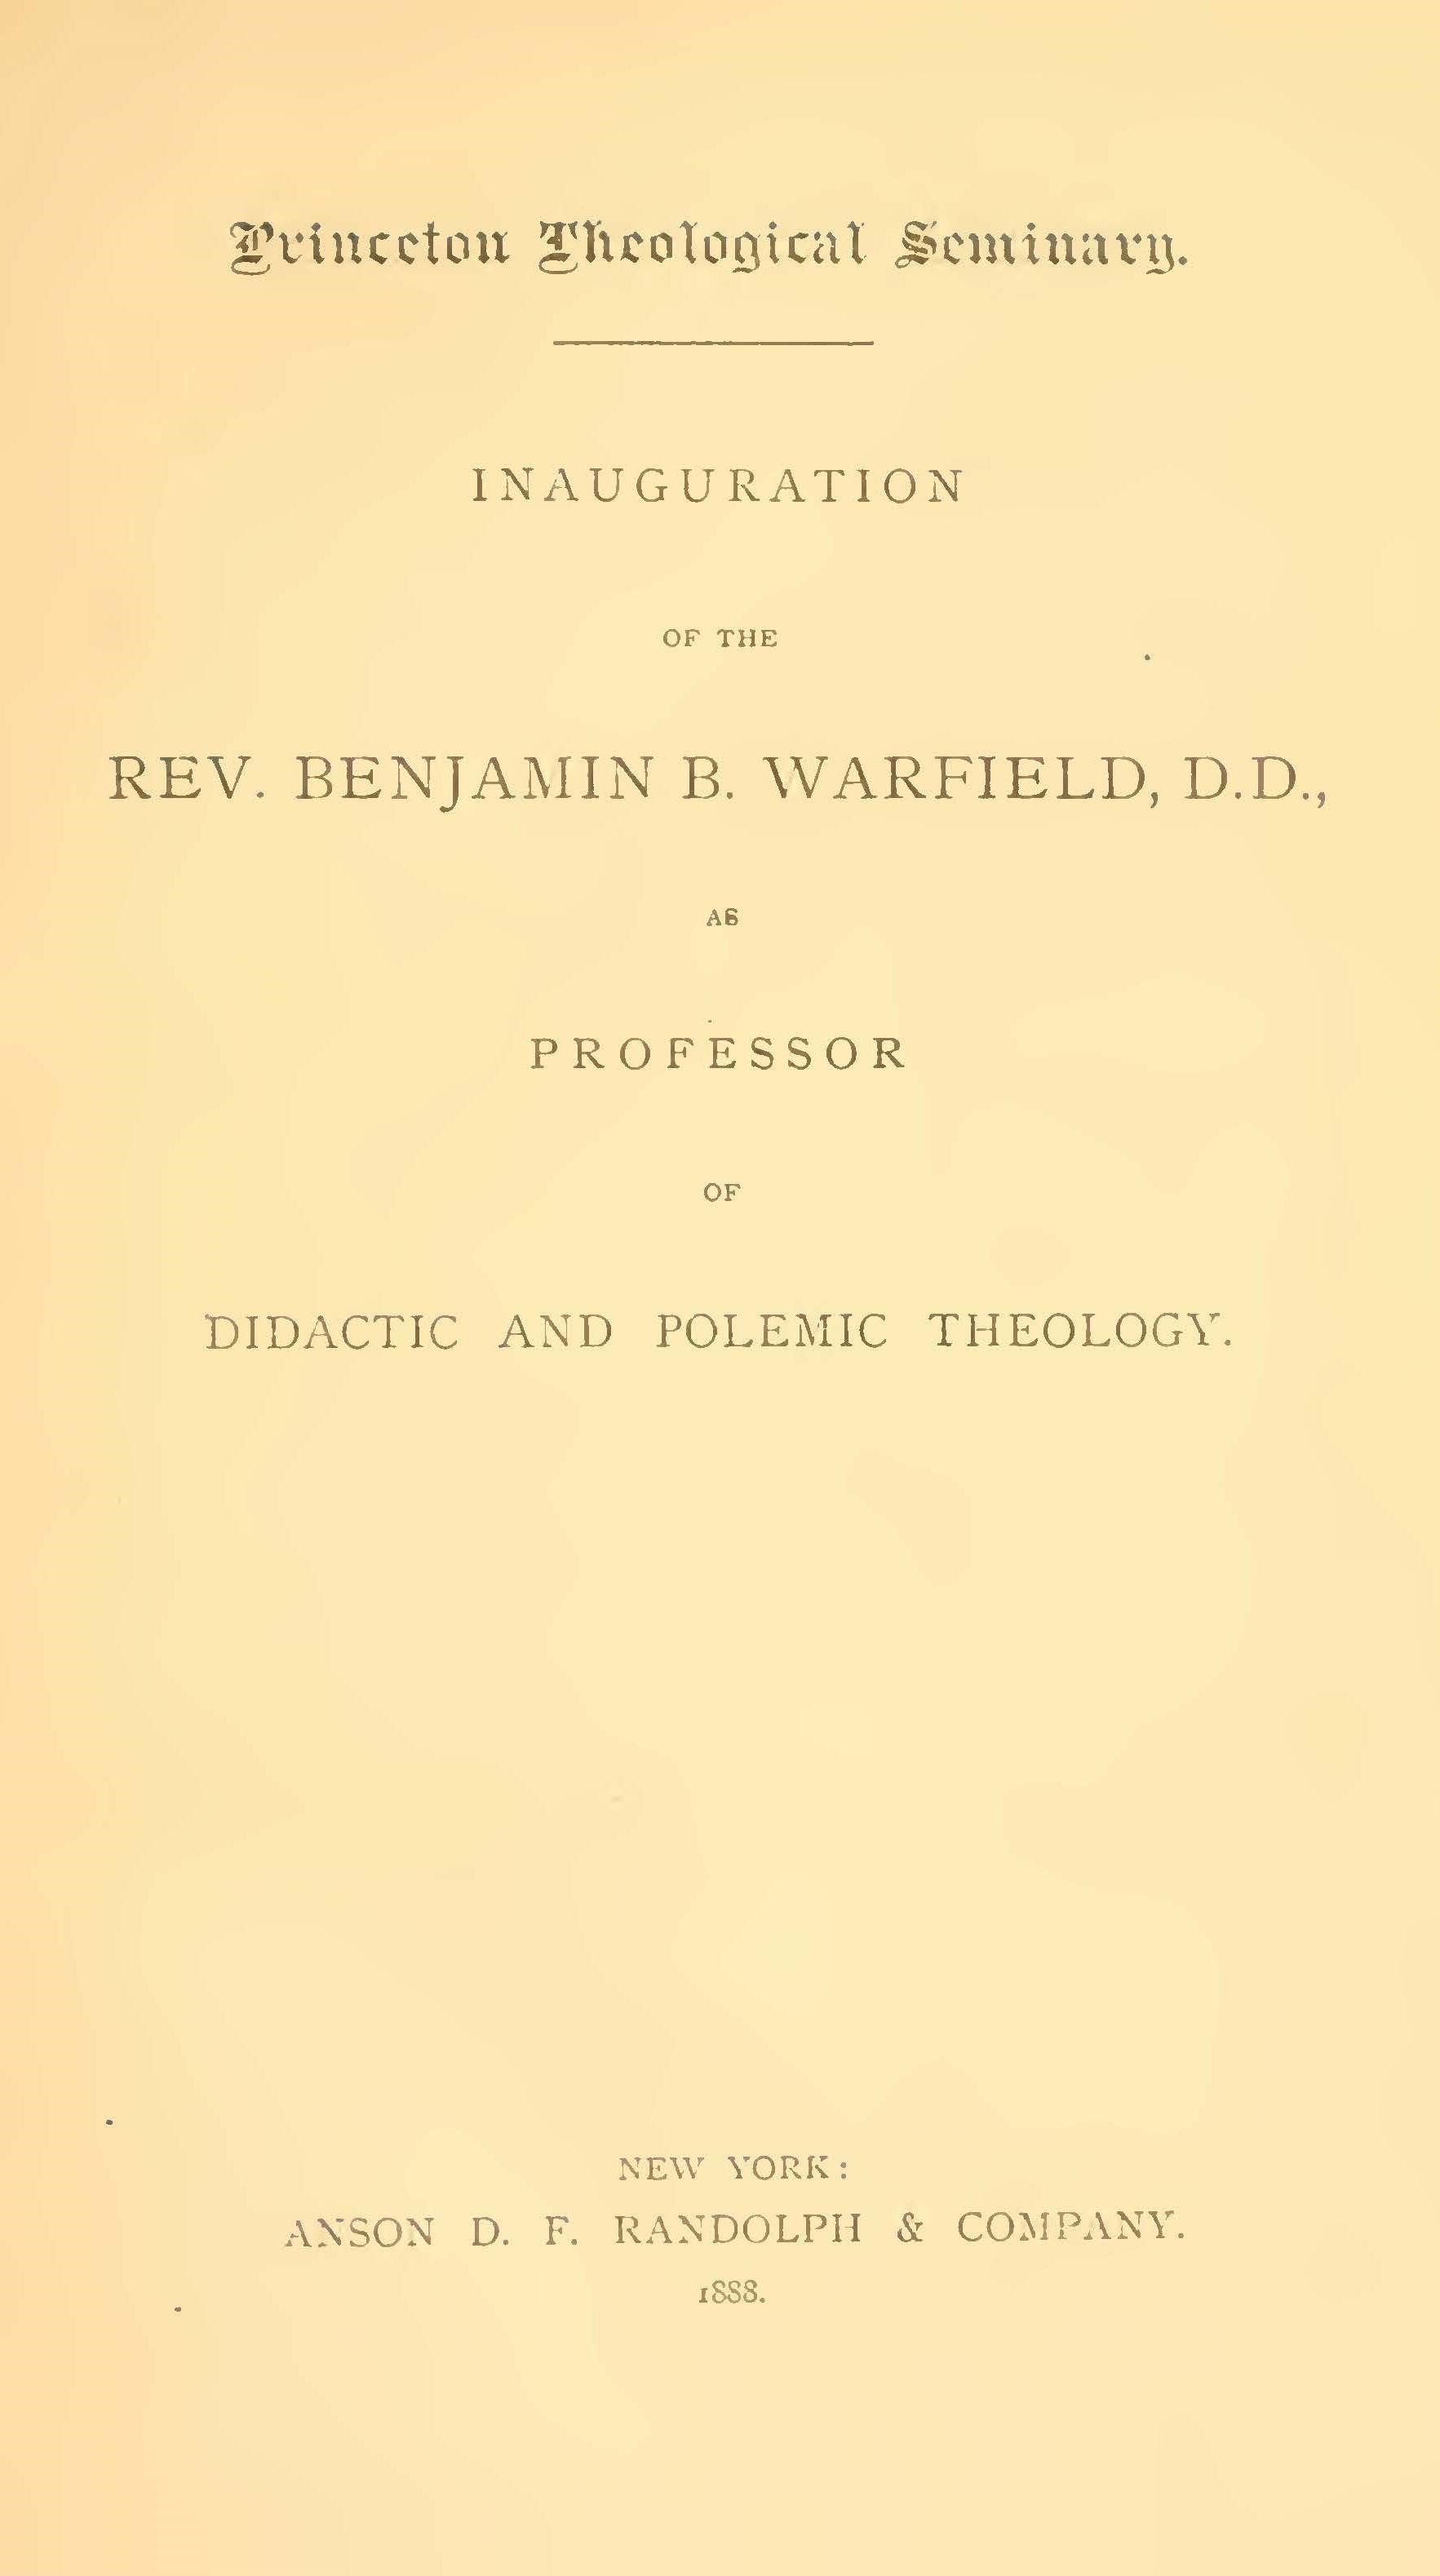 Warfield, Inaugural Address at Princeton.jpg